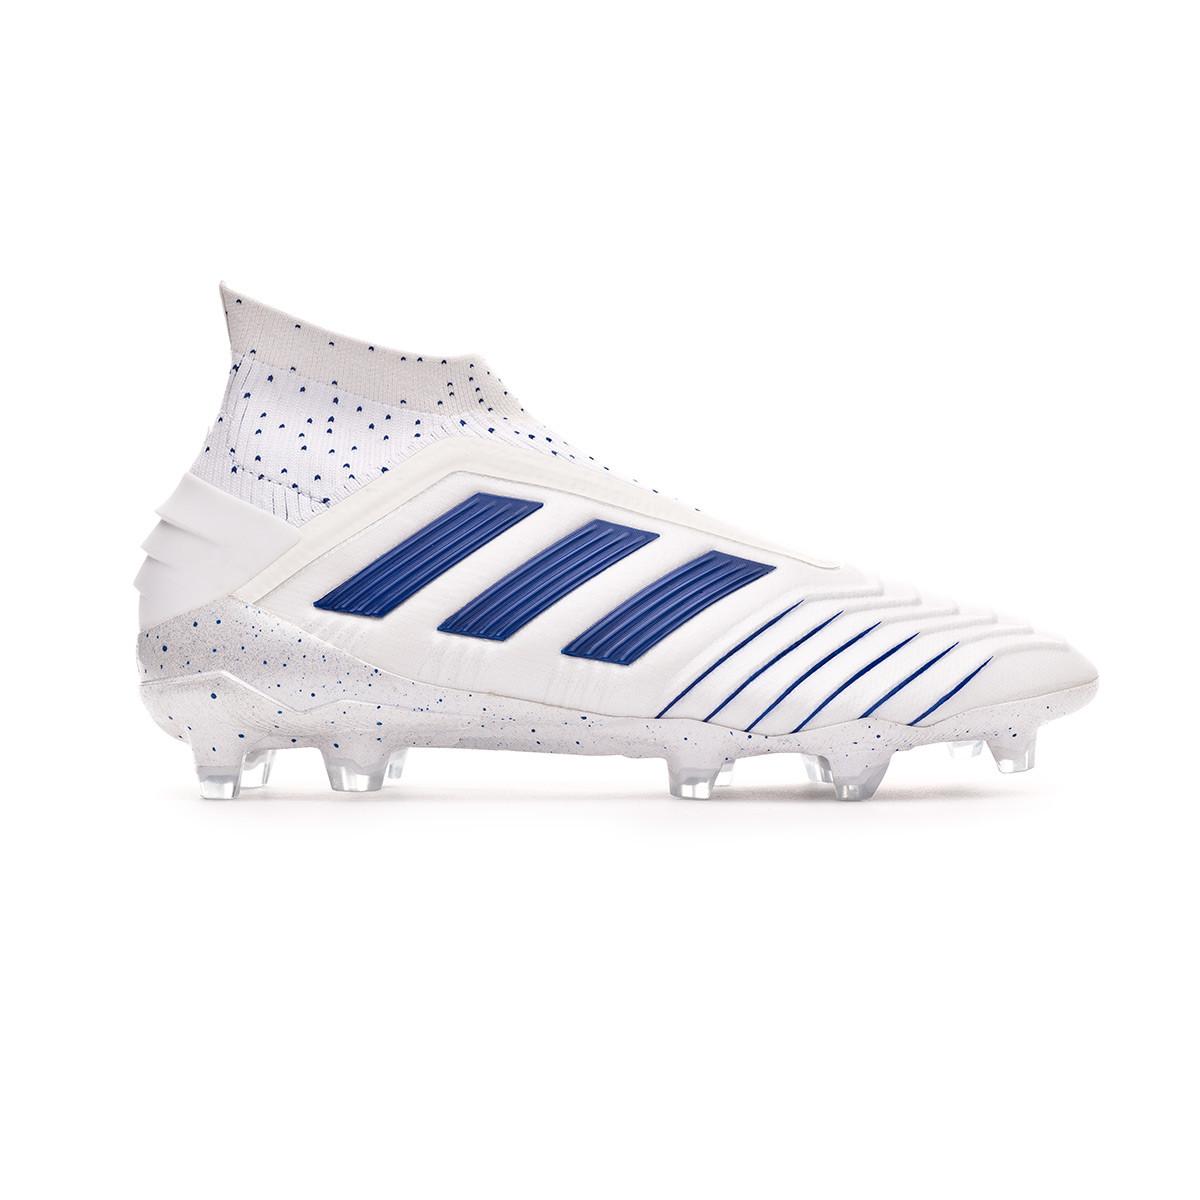 f52a9a900 Football Boots adidas Predator 19+ FG White-Bold blue - Nike Mercurial  Superfly | Shop Nike Soccer Cleats ypsoccer.com